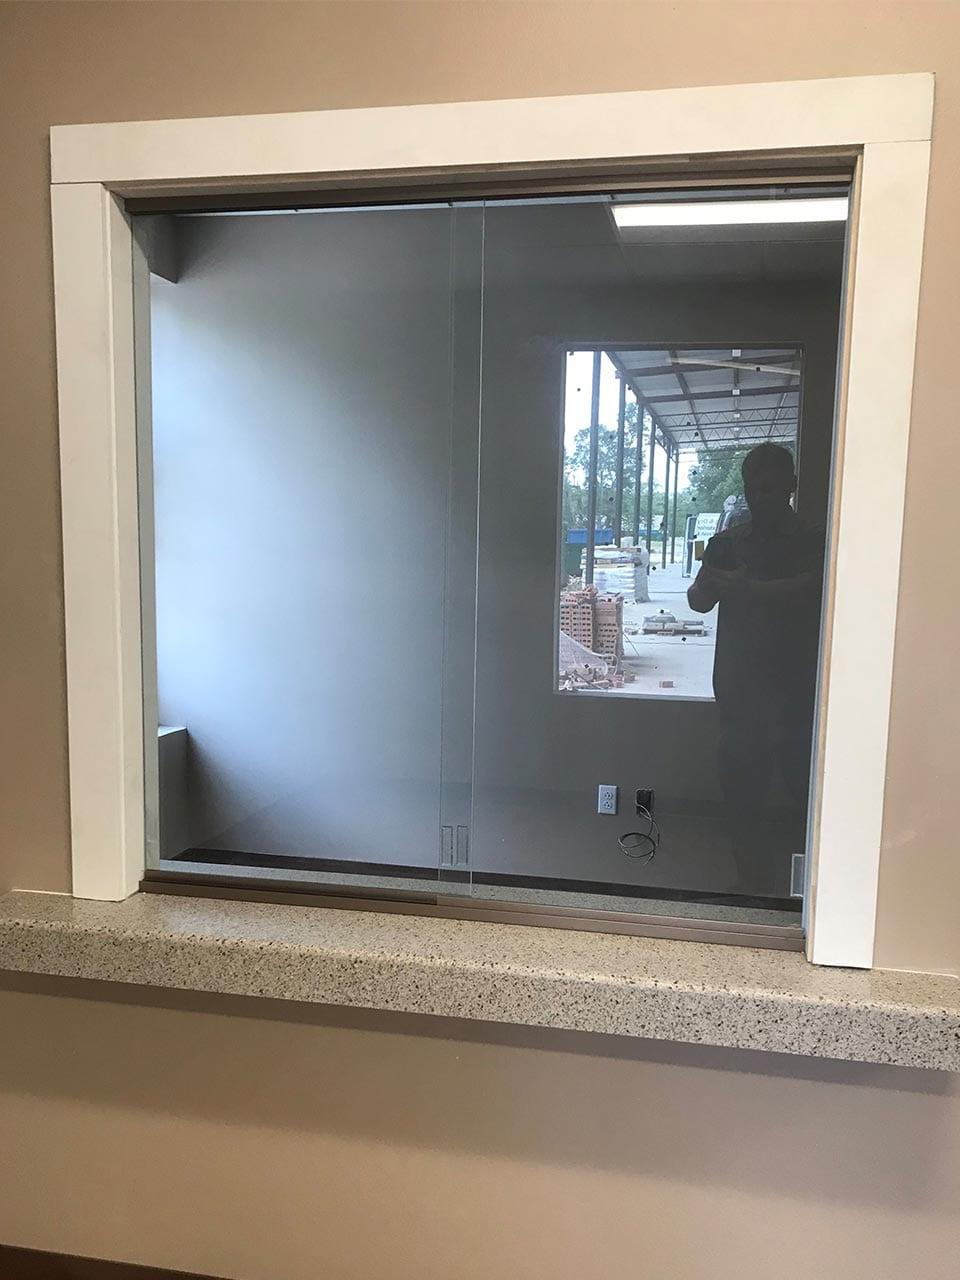 Sliding Reception Glass Window by Reliable Glass & Mirror